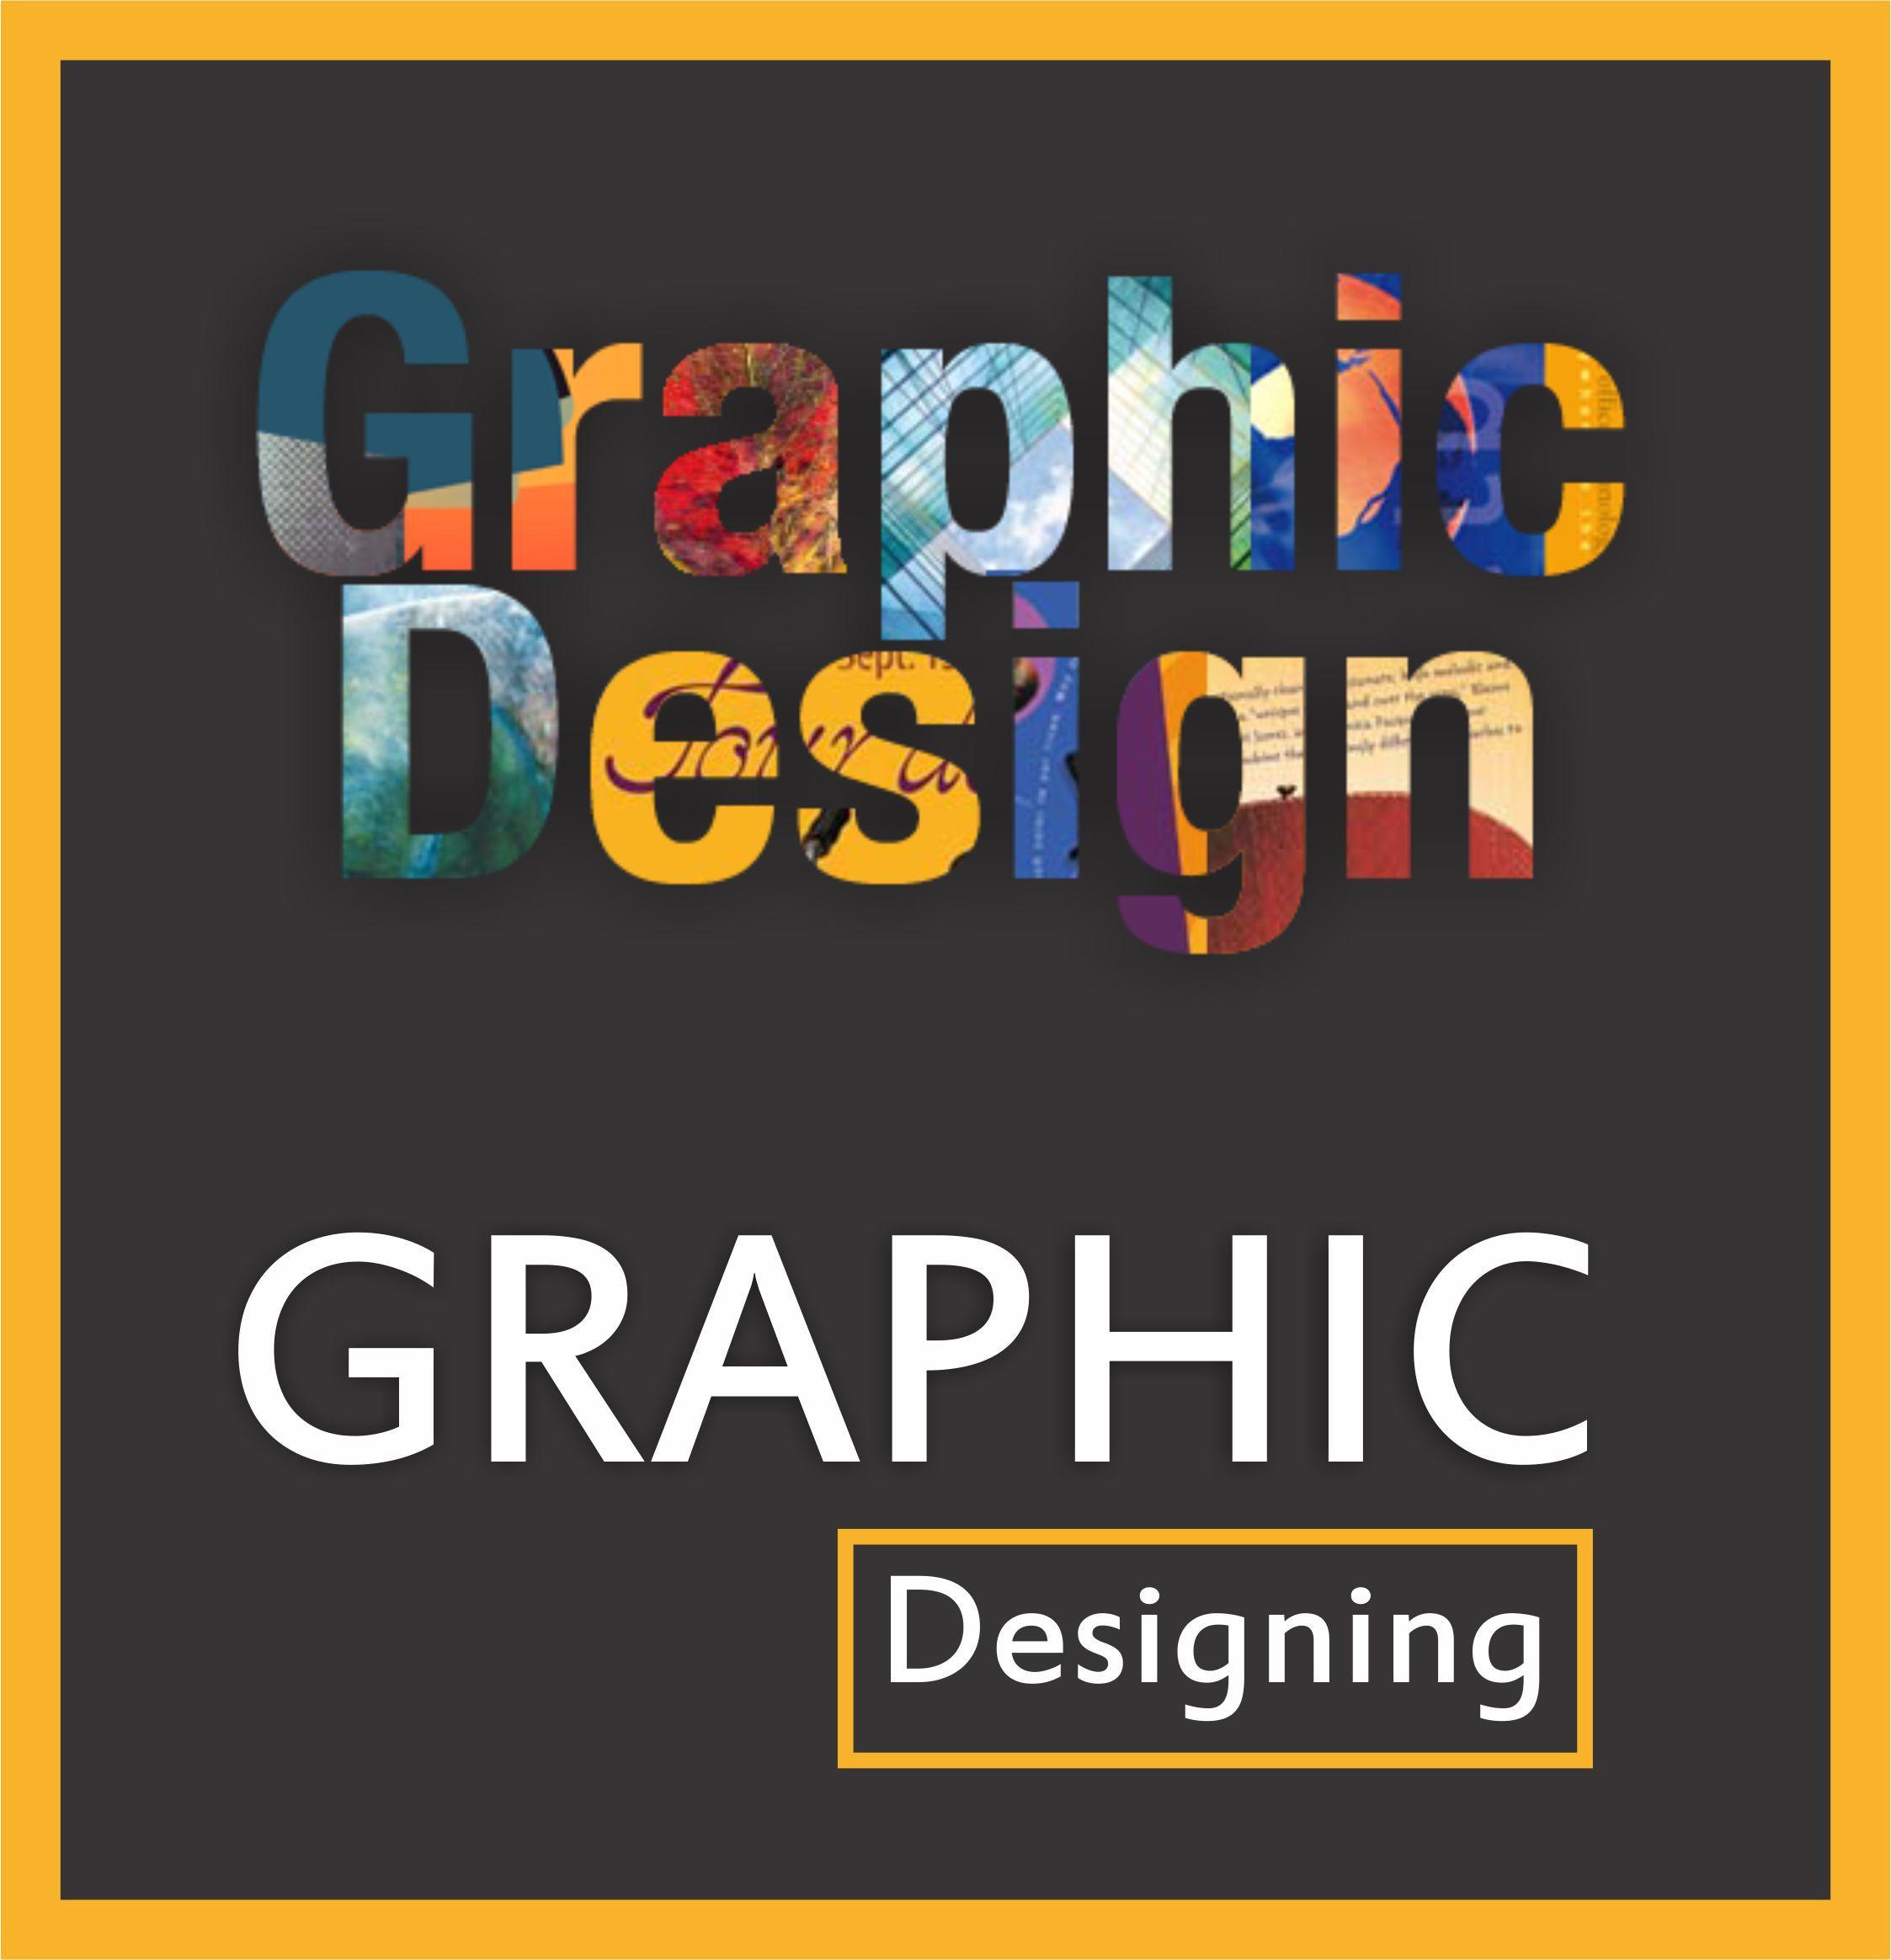 Graphics Designing Company In Pune Imis Graphic Design Jobs Website Development Company Graphic Design